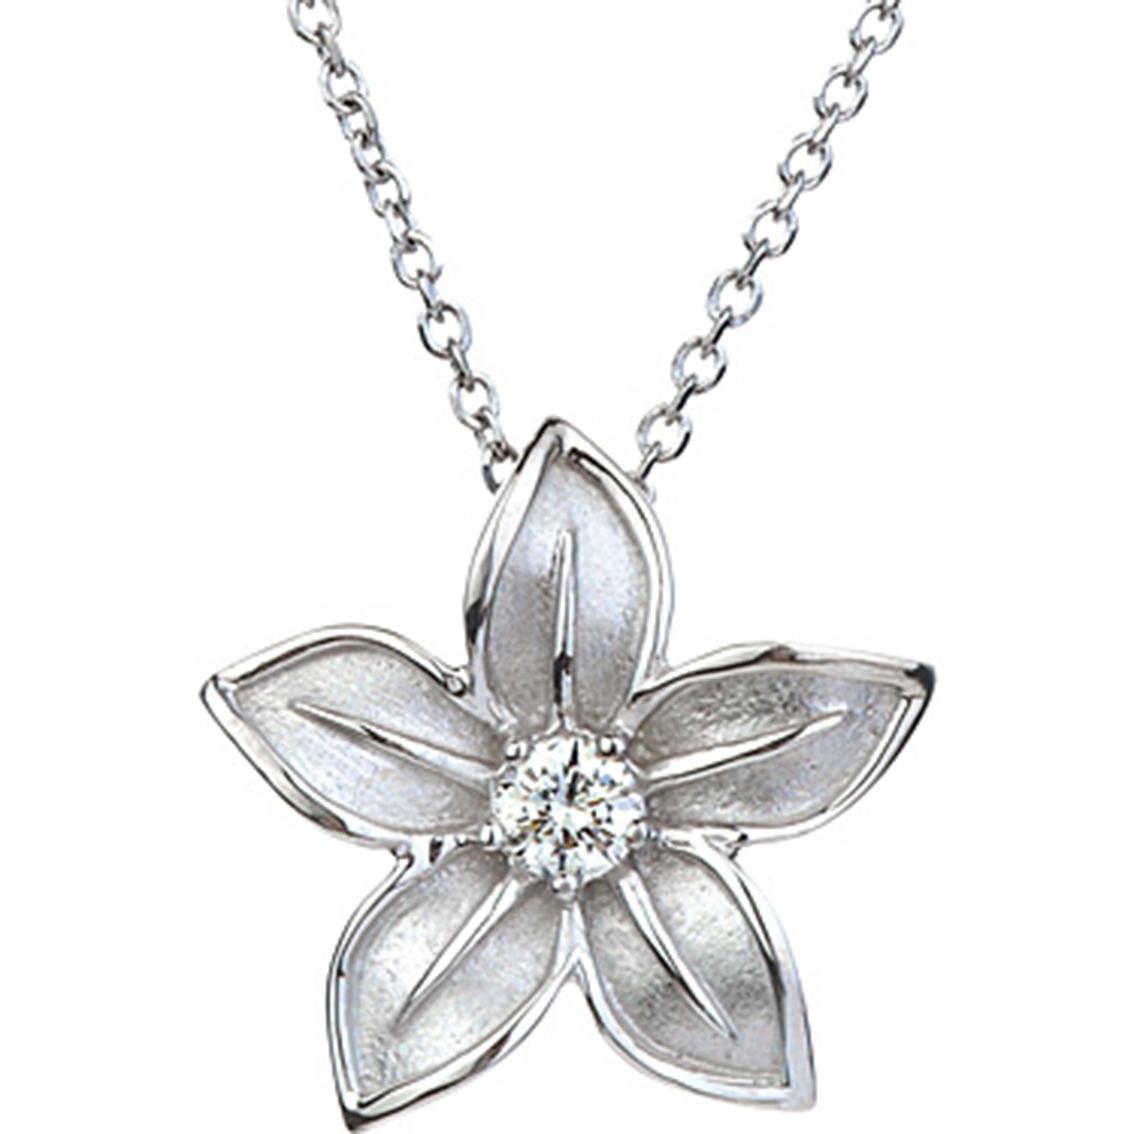 14k White Gold 1/6 Ct. 5 Petal Flower Pendant With Diamond ...